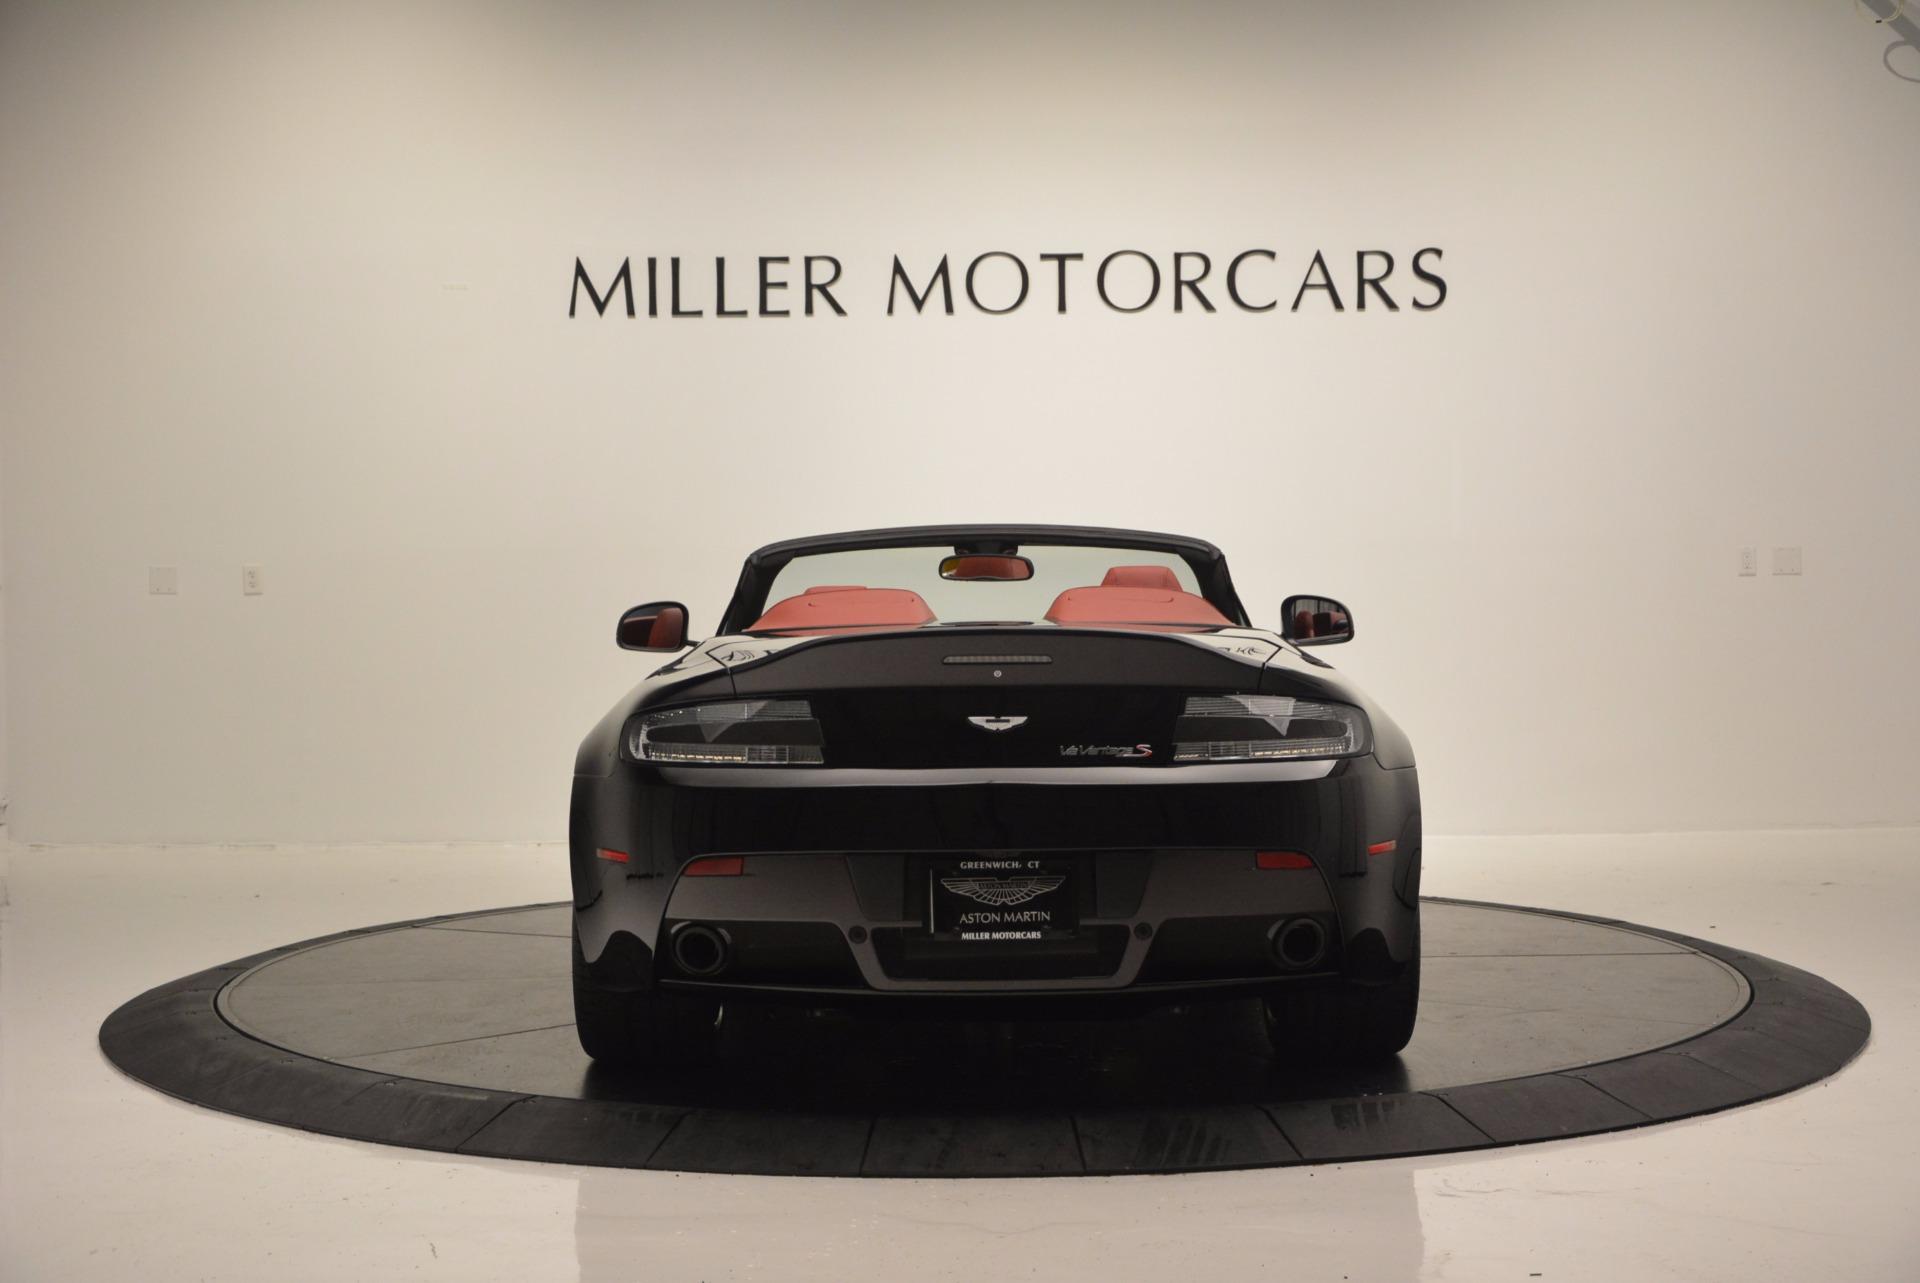 Used 2015 Aston Martin V12 Vantage S Roadster For Sale In Greenwich, CT. Alfa Romeo of Greenwich, 7227 1335_p6